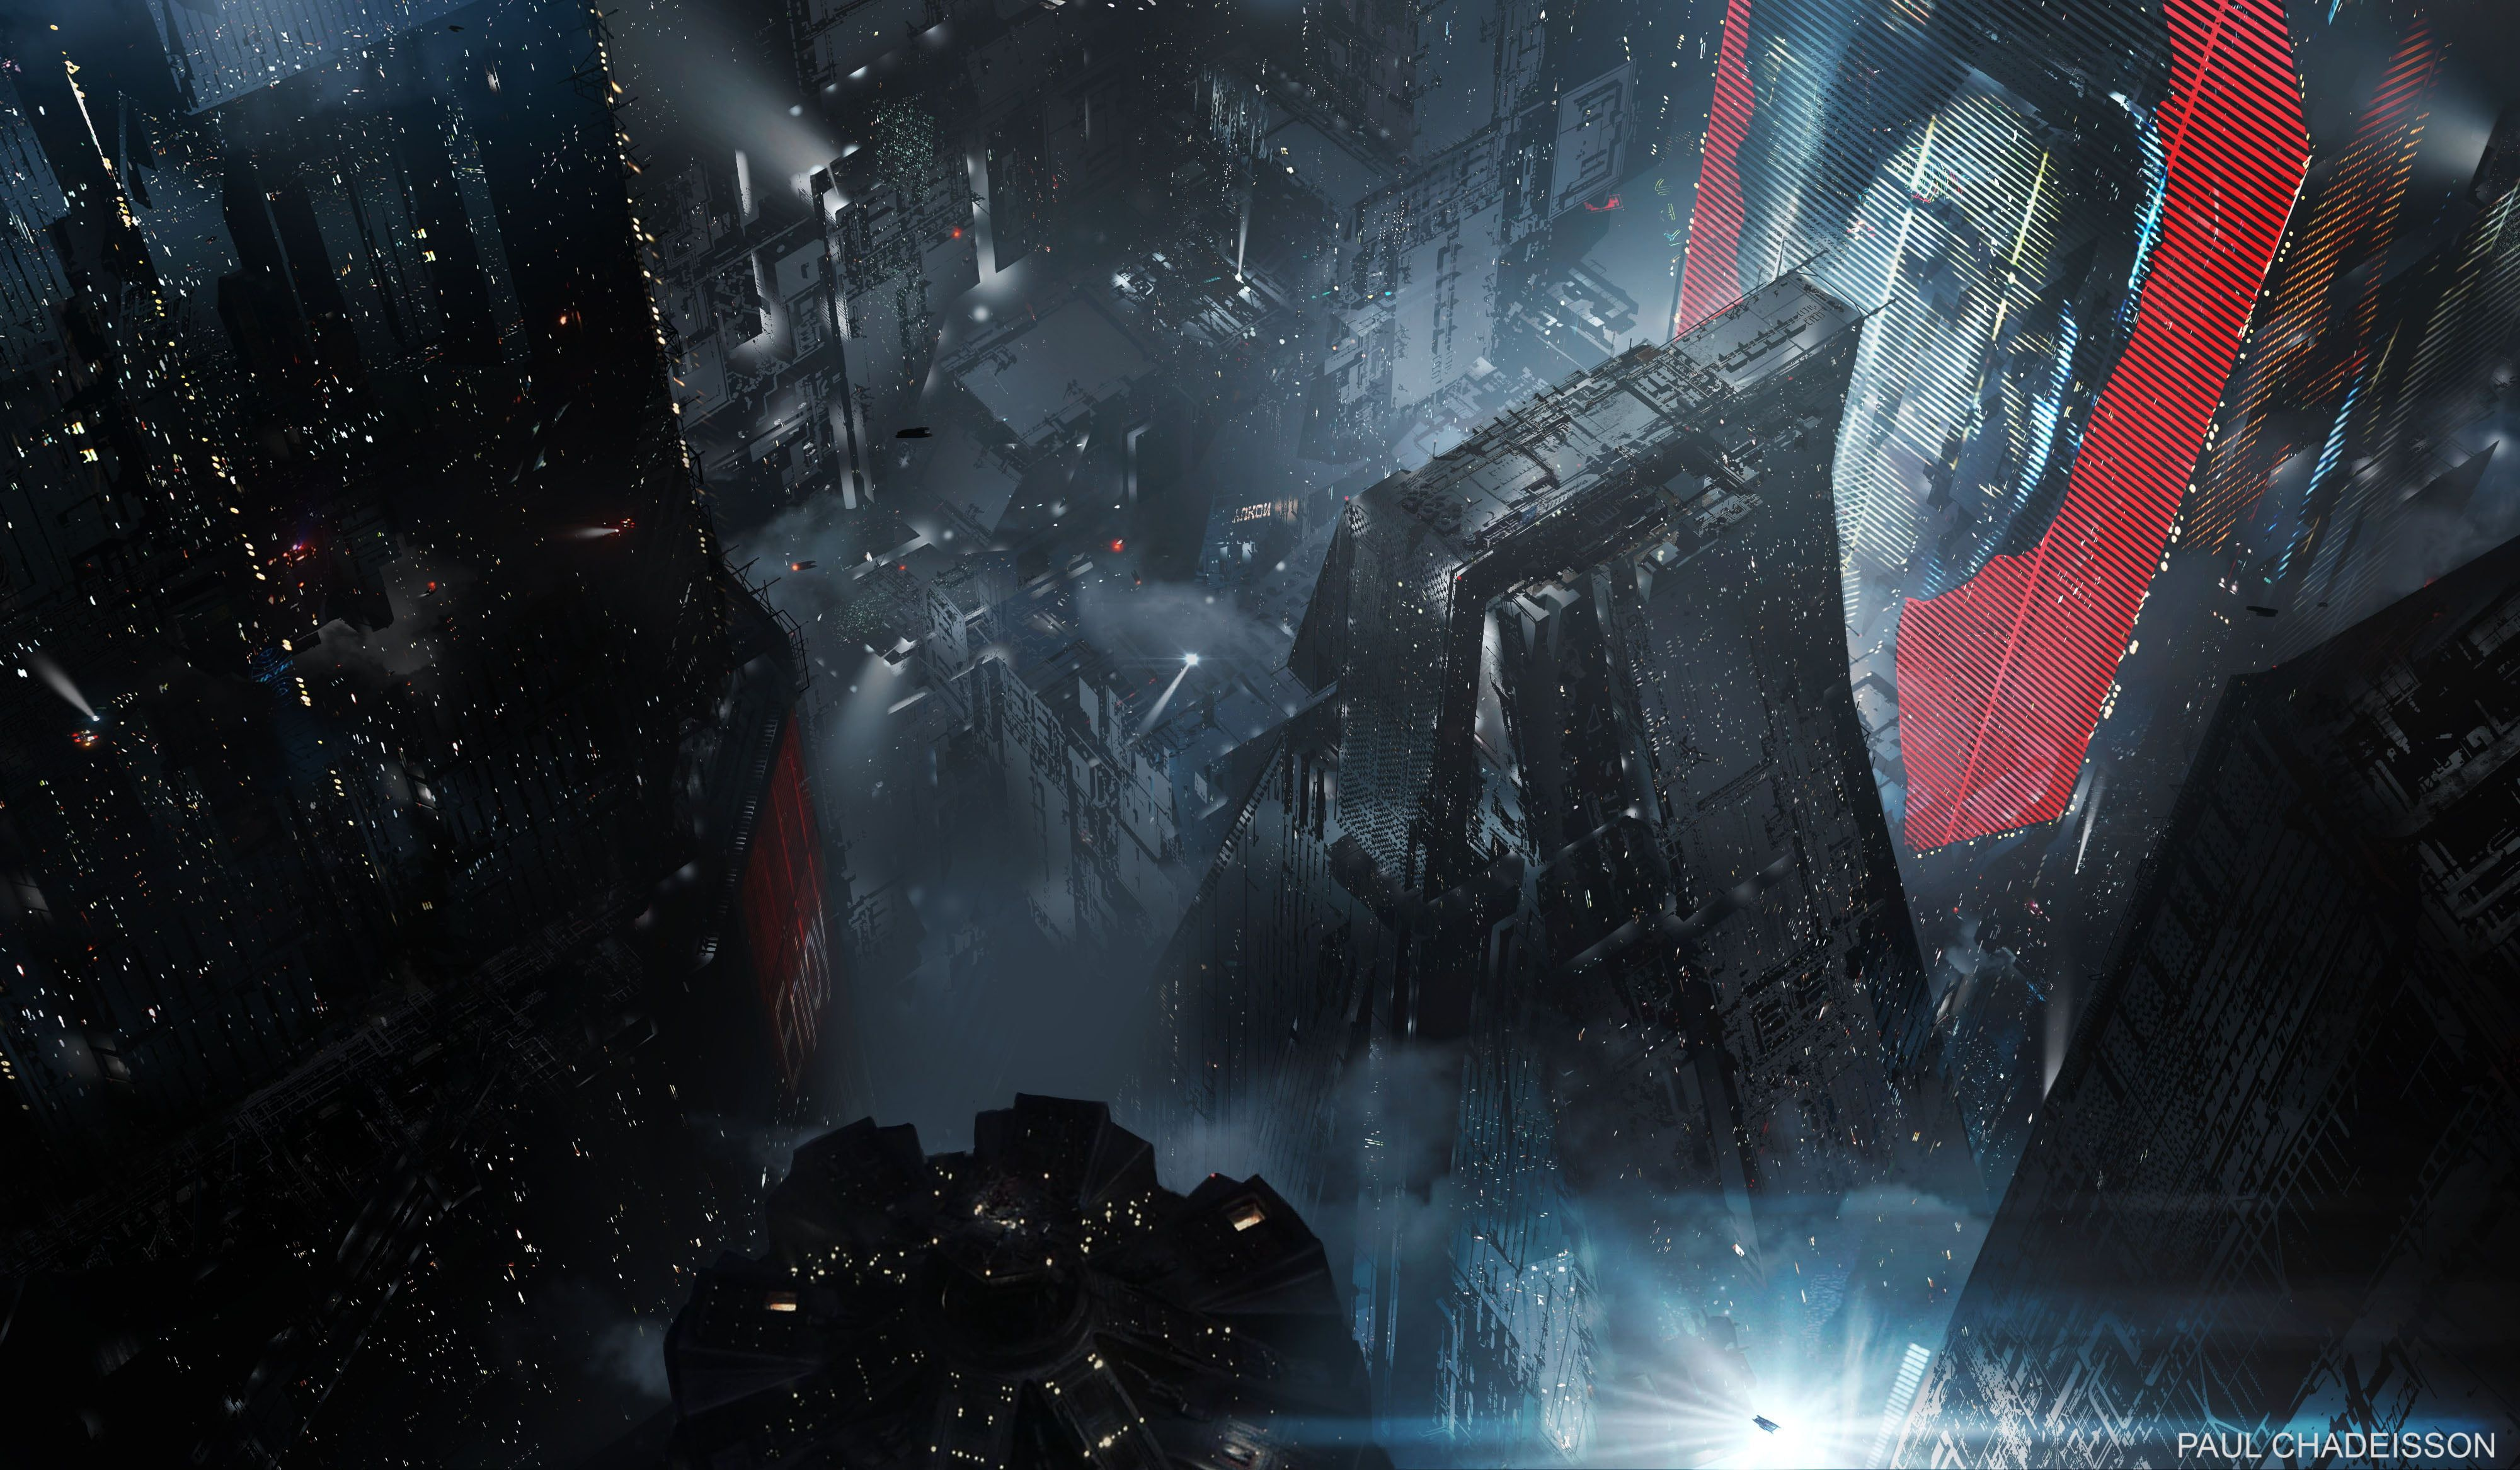 Futuristic Building Graphics Blade Runner 2049 Movies Futuristic Science Fiction 4k Wallpaper Hdwall Blade Runner Blade Runner Wallpaper Blade Runner 2049